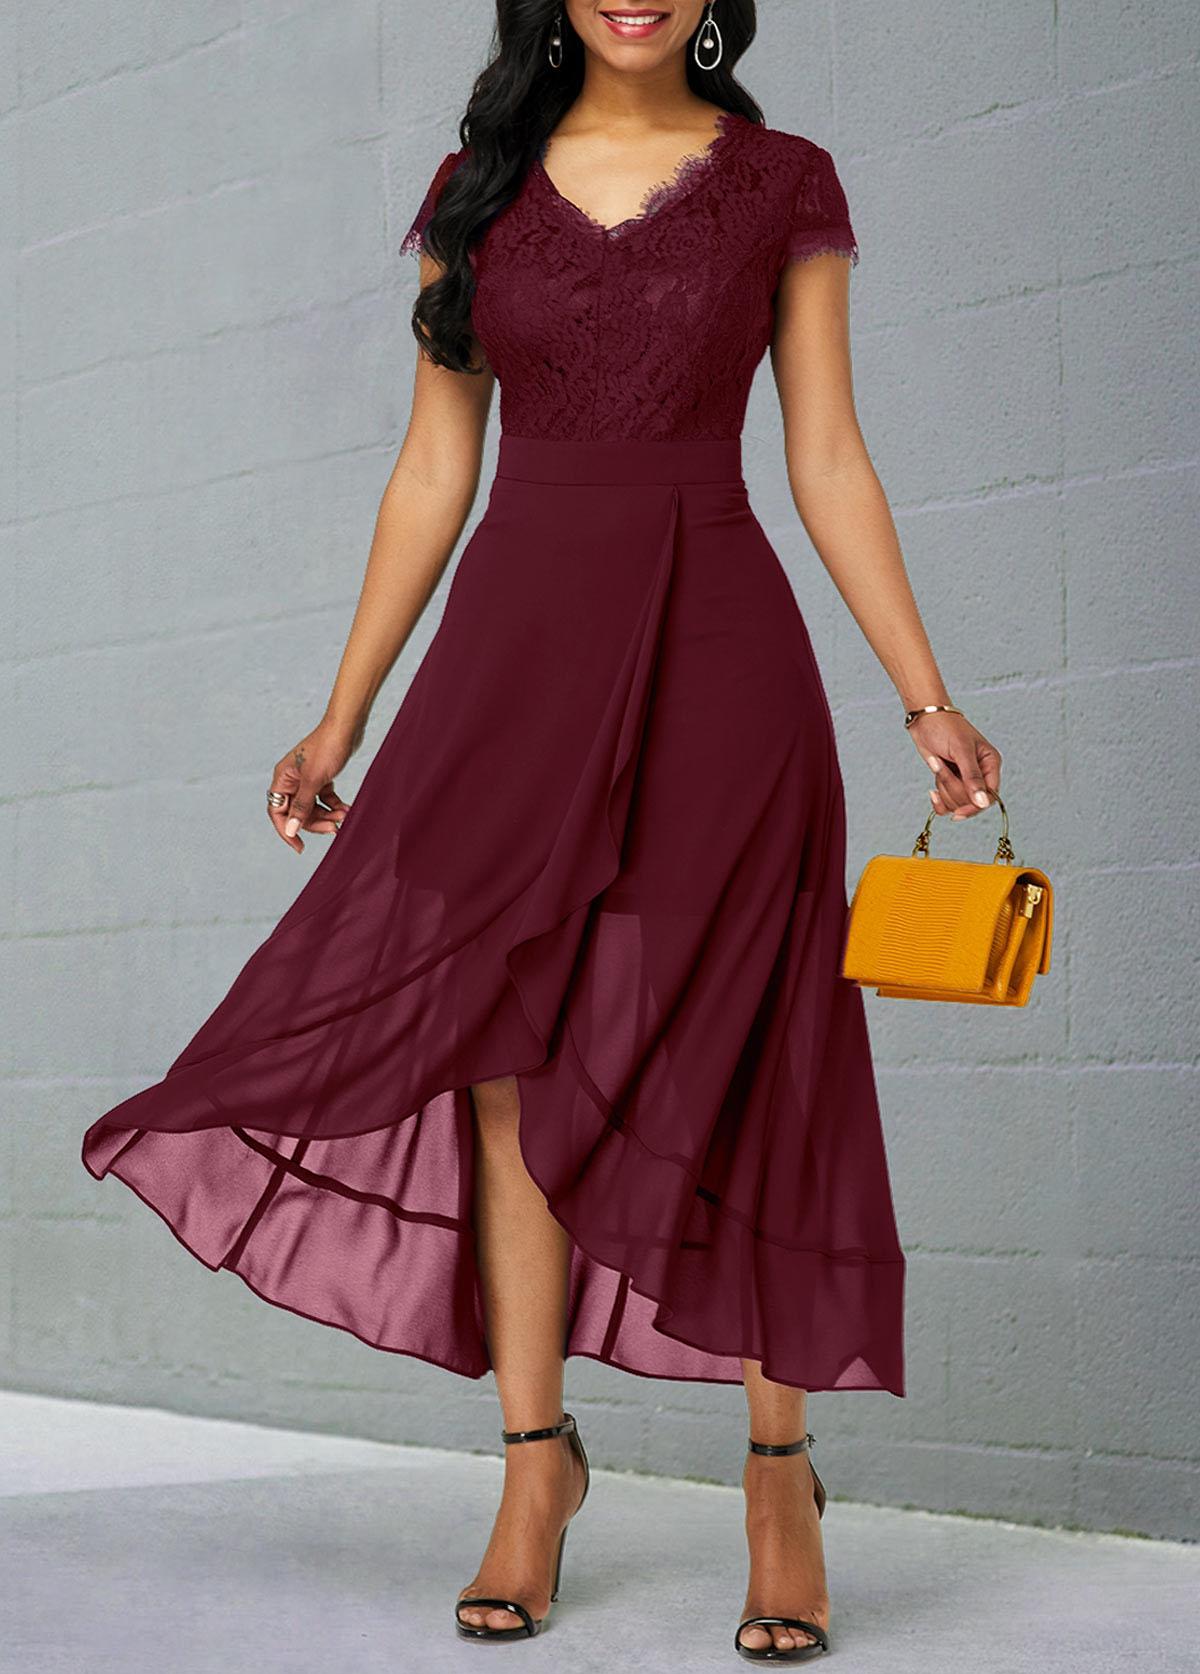 Lace Patchwork Short Sleeve Chiffon Dress